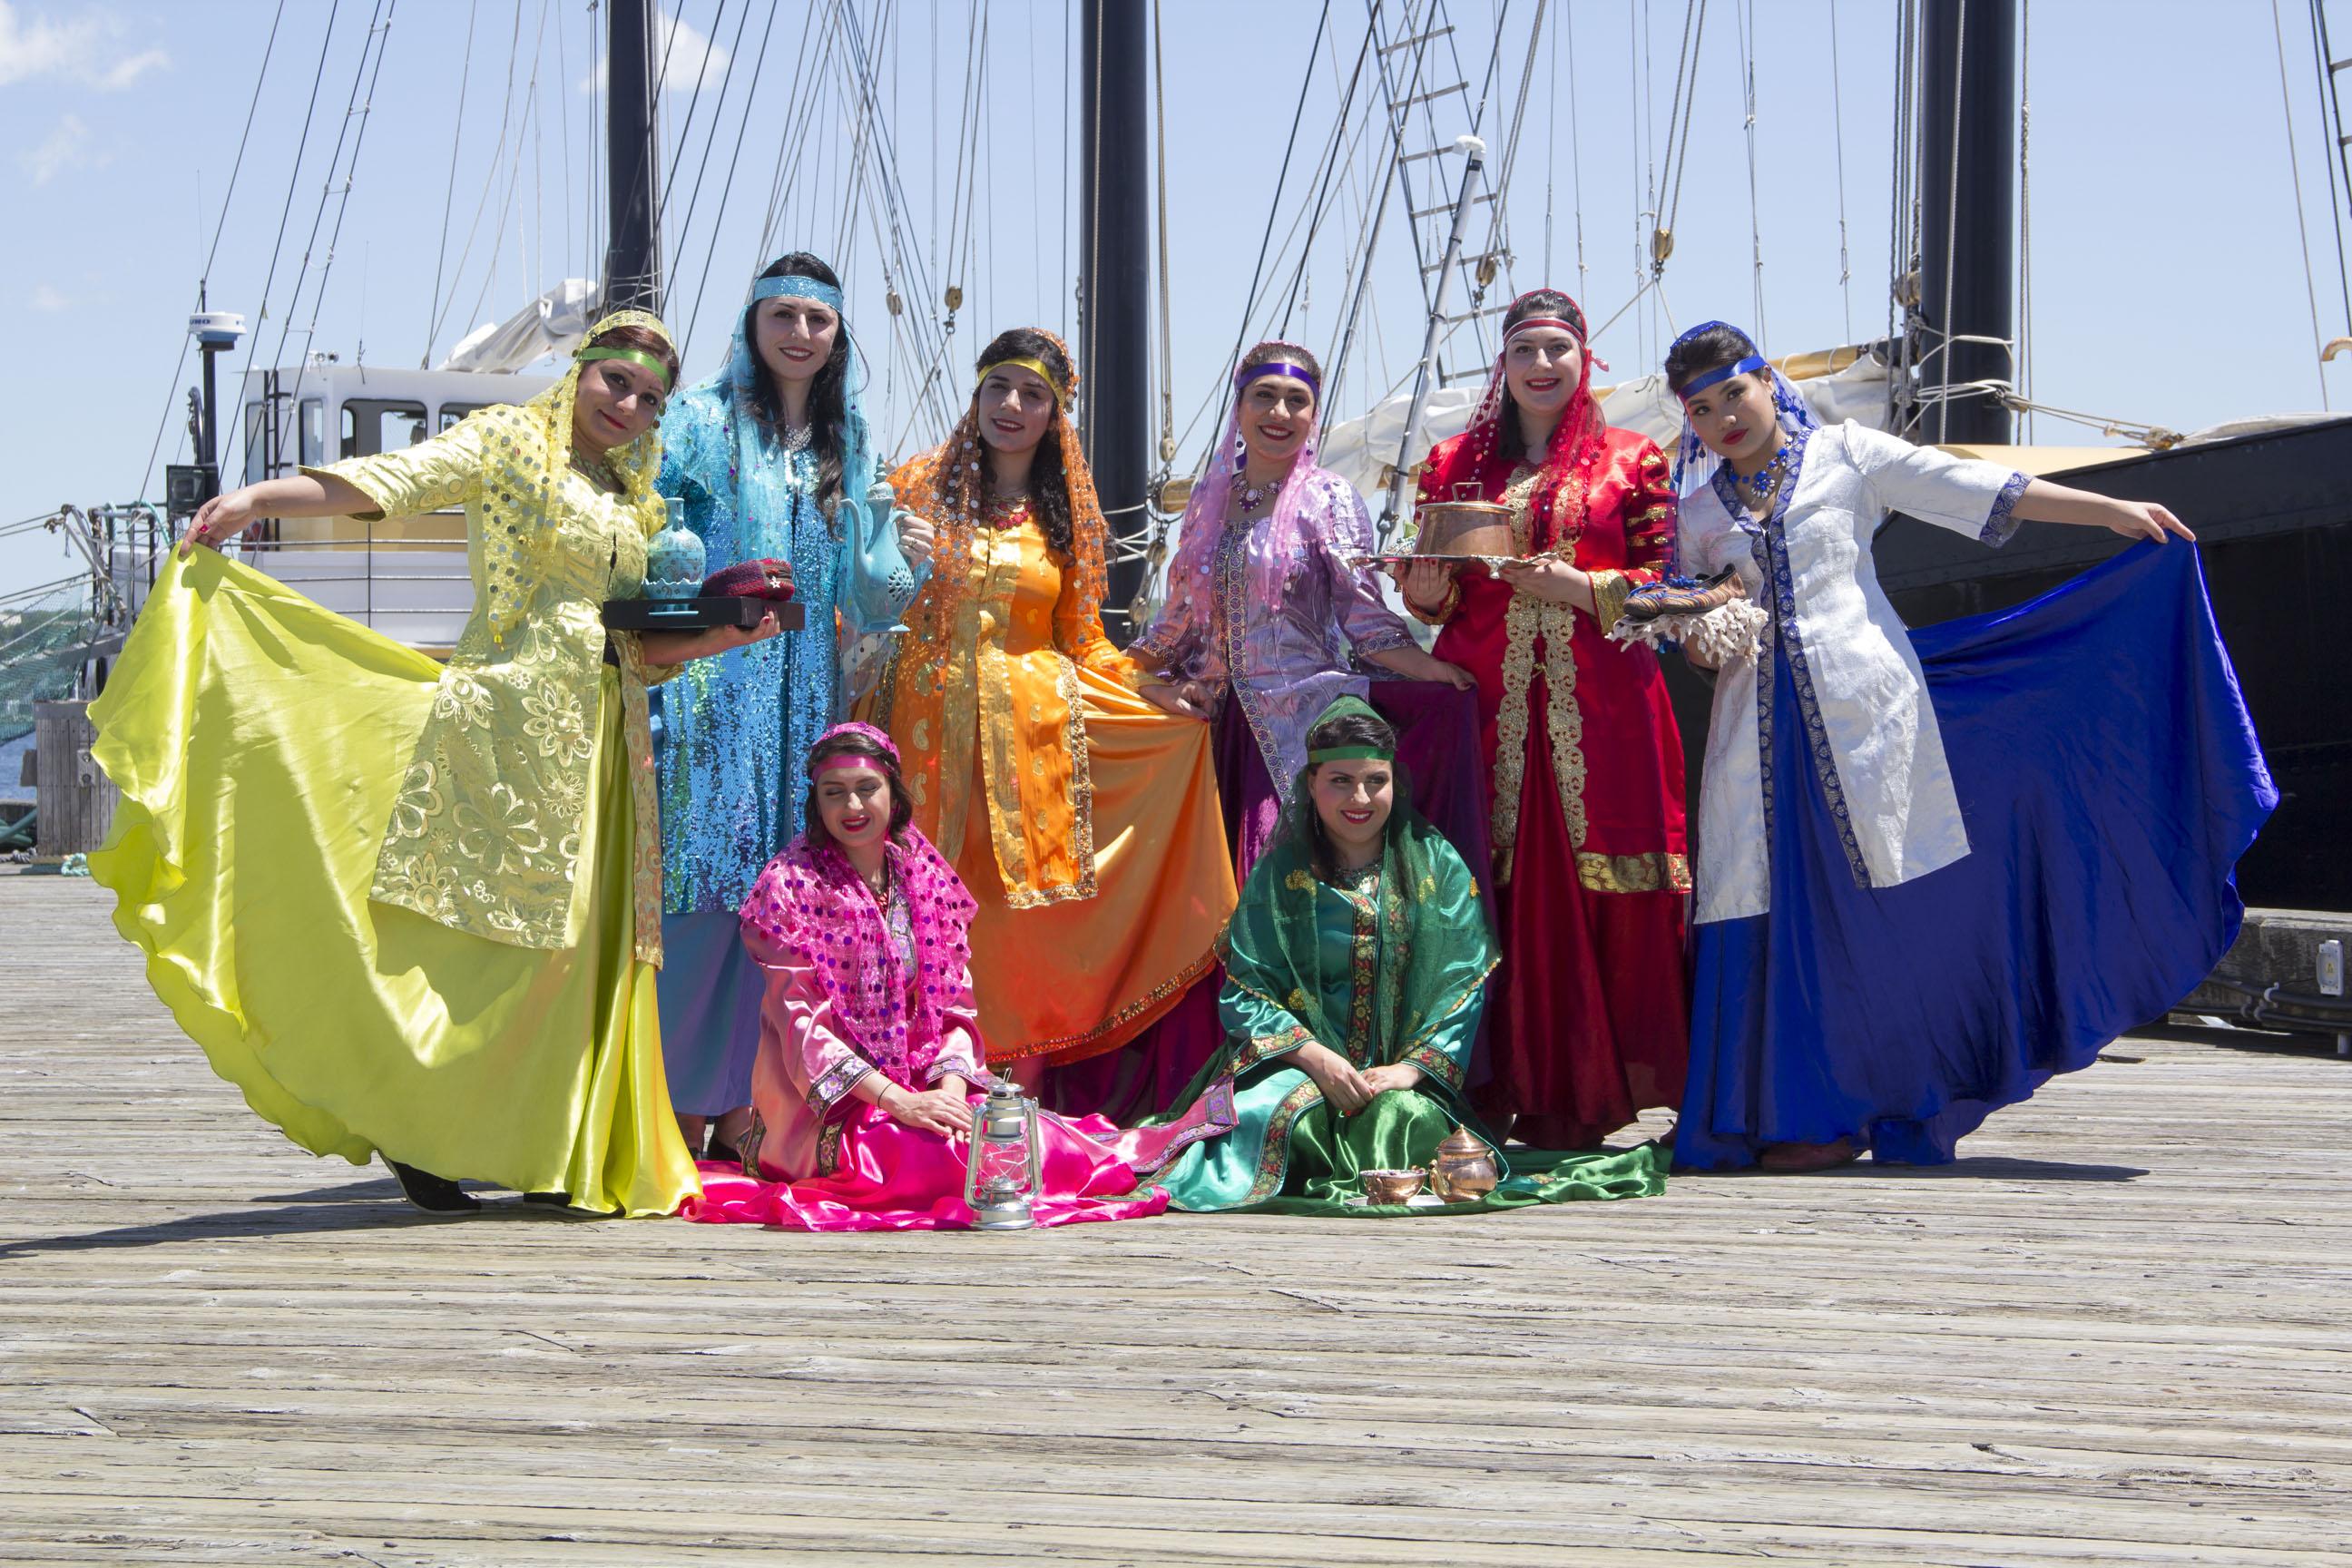 Standing_ Shekoufeh, Farzaneh, Neda,Setareh, Pegah, Tanisha. Sitting_ Setareh, Sara